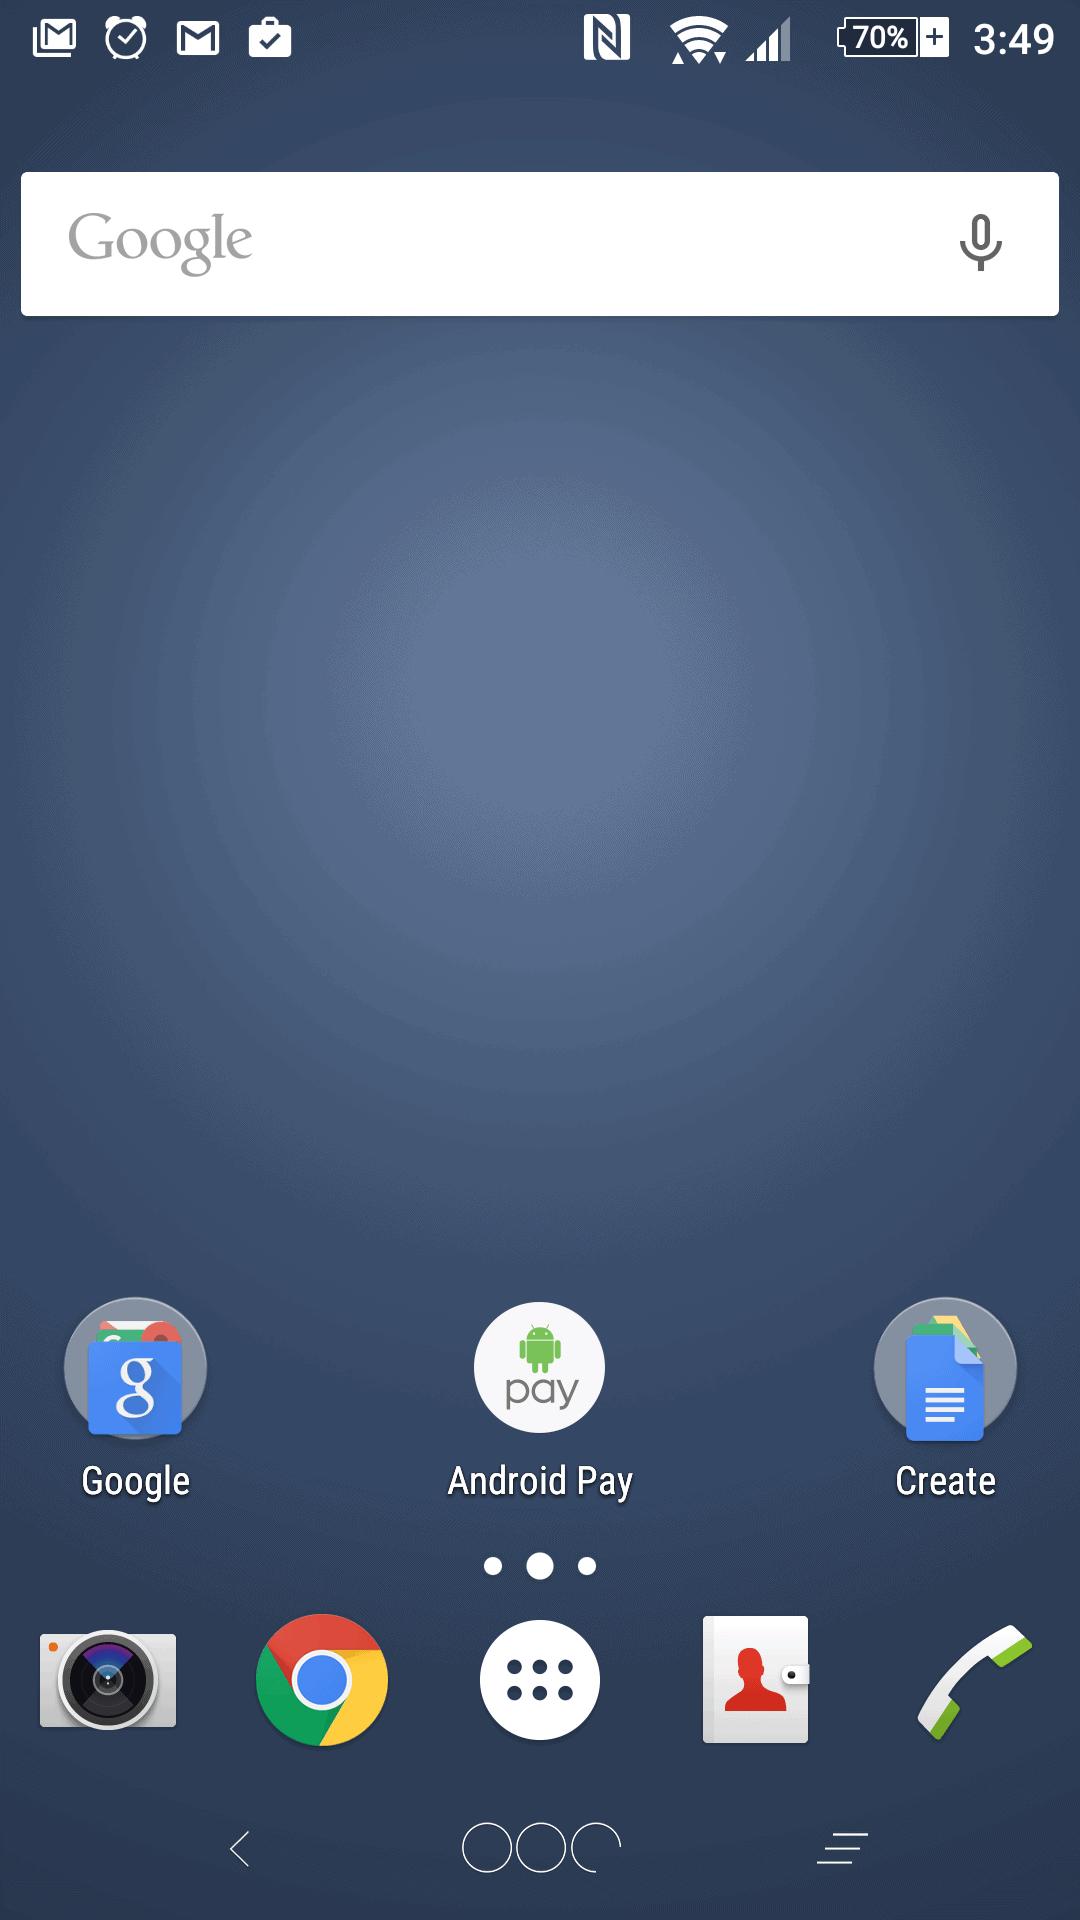 Screenshot 2015 09 03 15 49 34